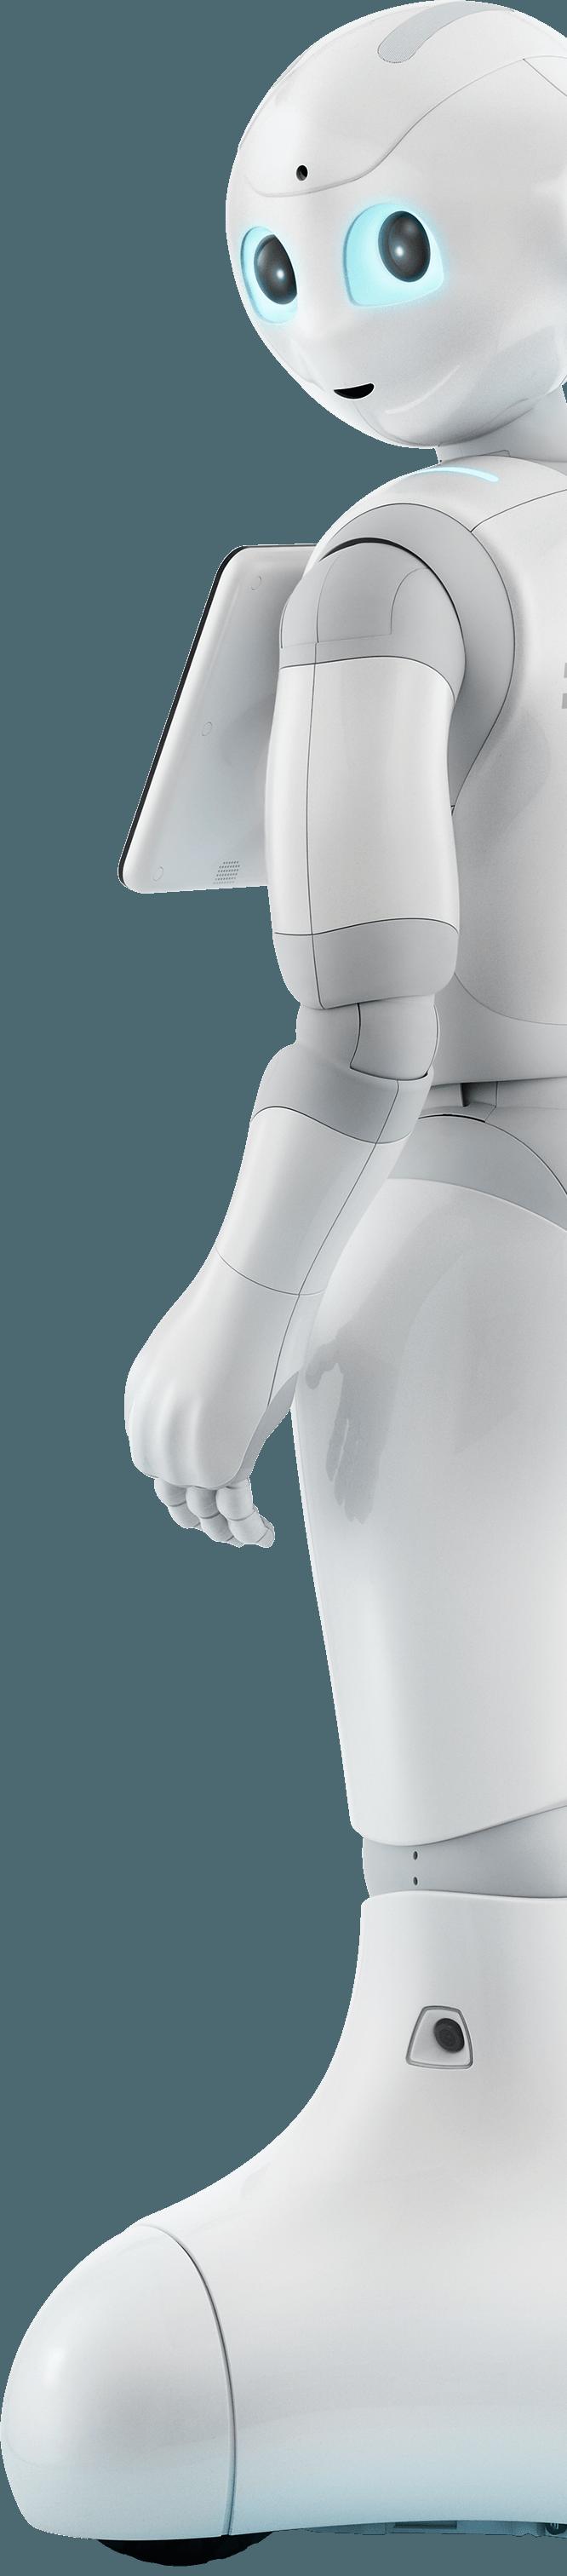 Pepper Humanoid Robot ربات پپر